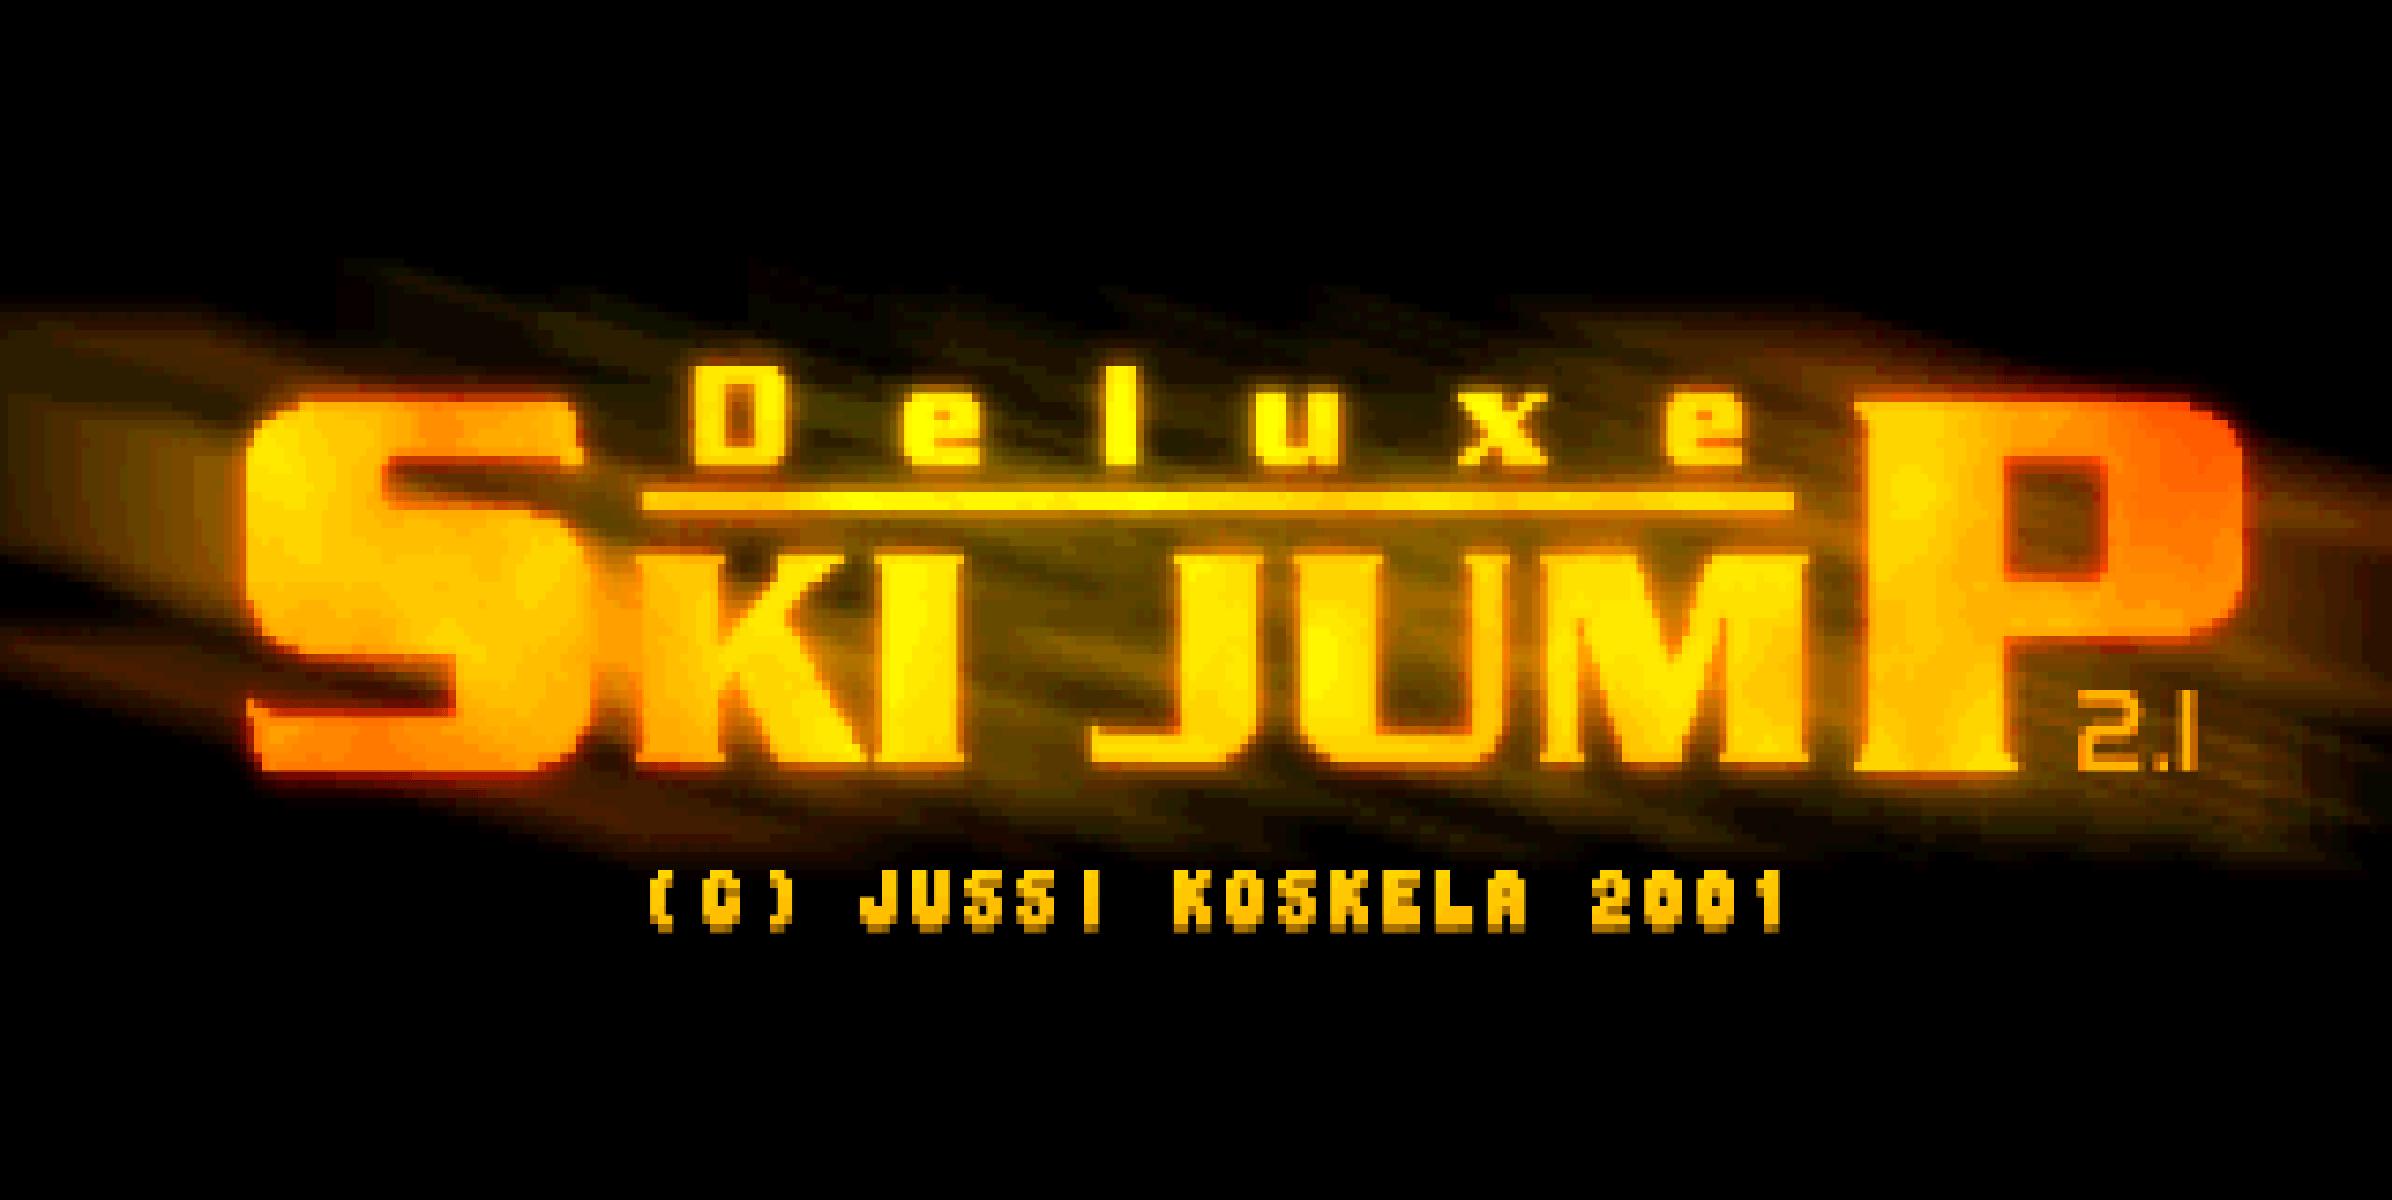 Deluxe ski jump 2 2. 1 download instalki. Pl.